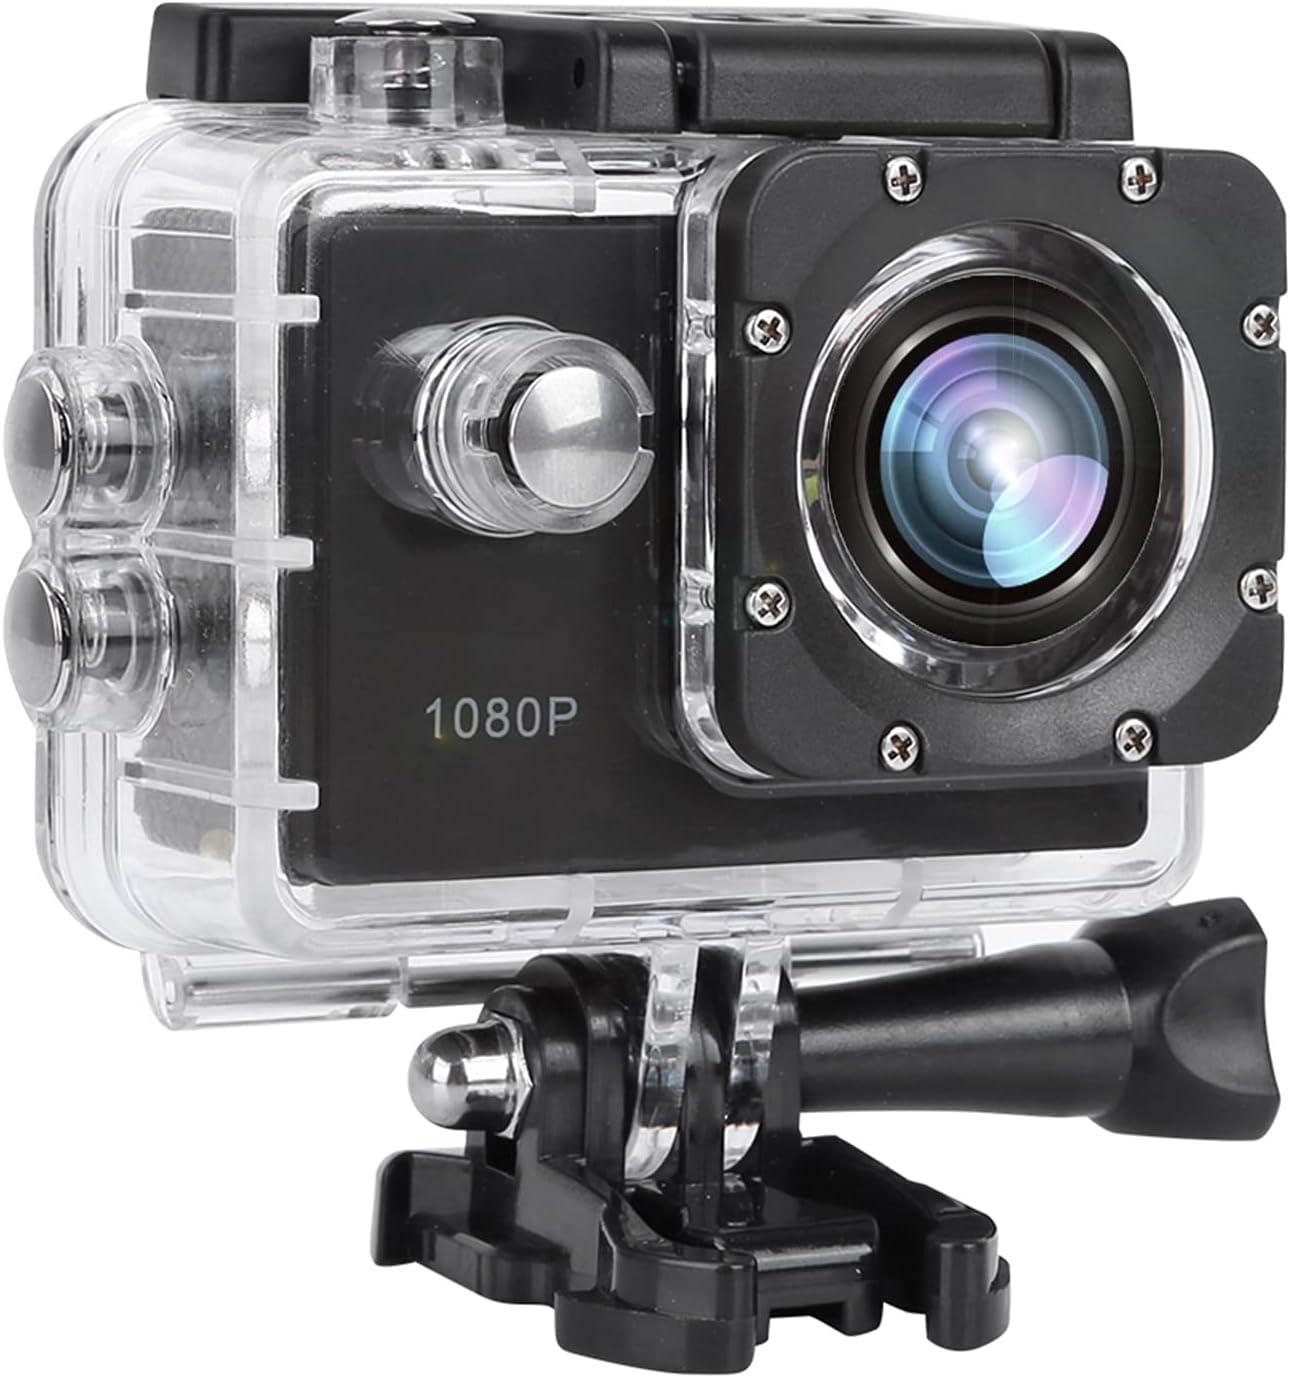 Cámara Deportiva 1080P, videocámara de acción Gran Angular de 30 m Impermeable a 140 ° con Pantalla TFT LCD de 2 Pulgadas, función de Toma única y Captura de instantáneas(Negro)